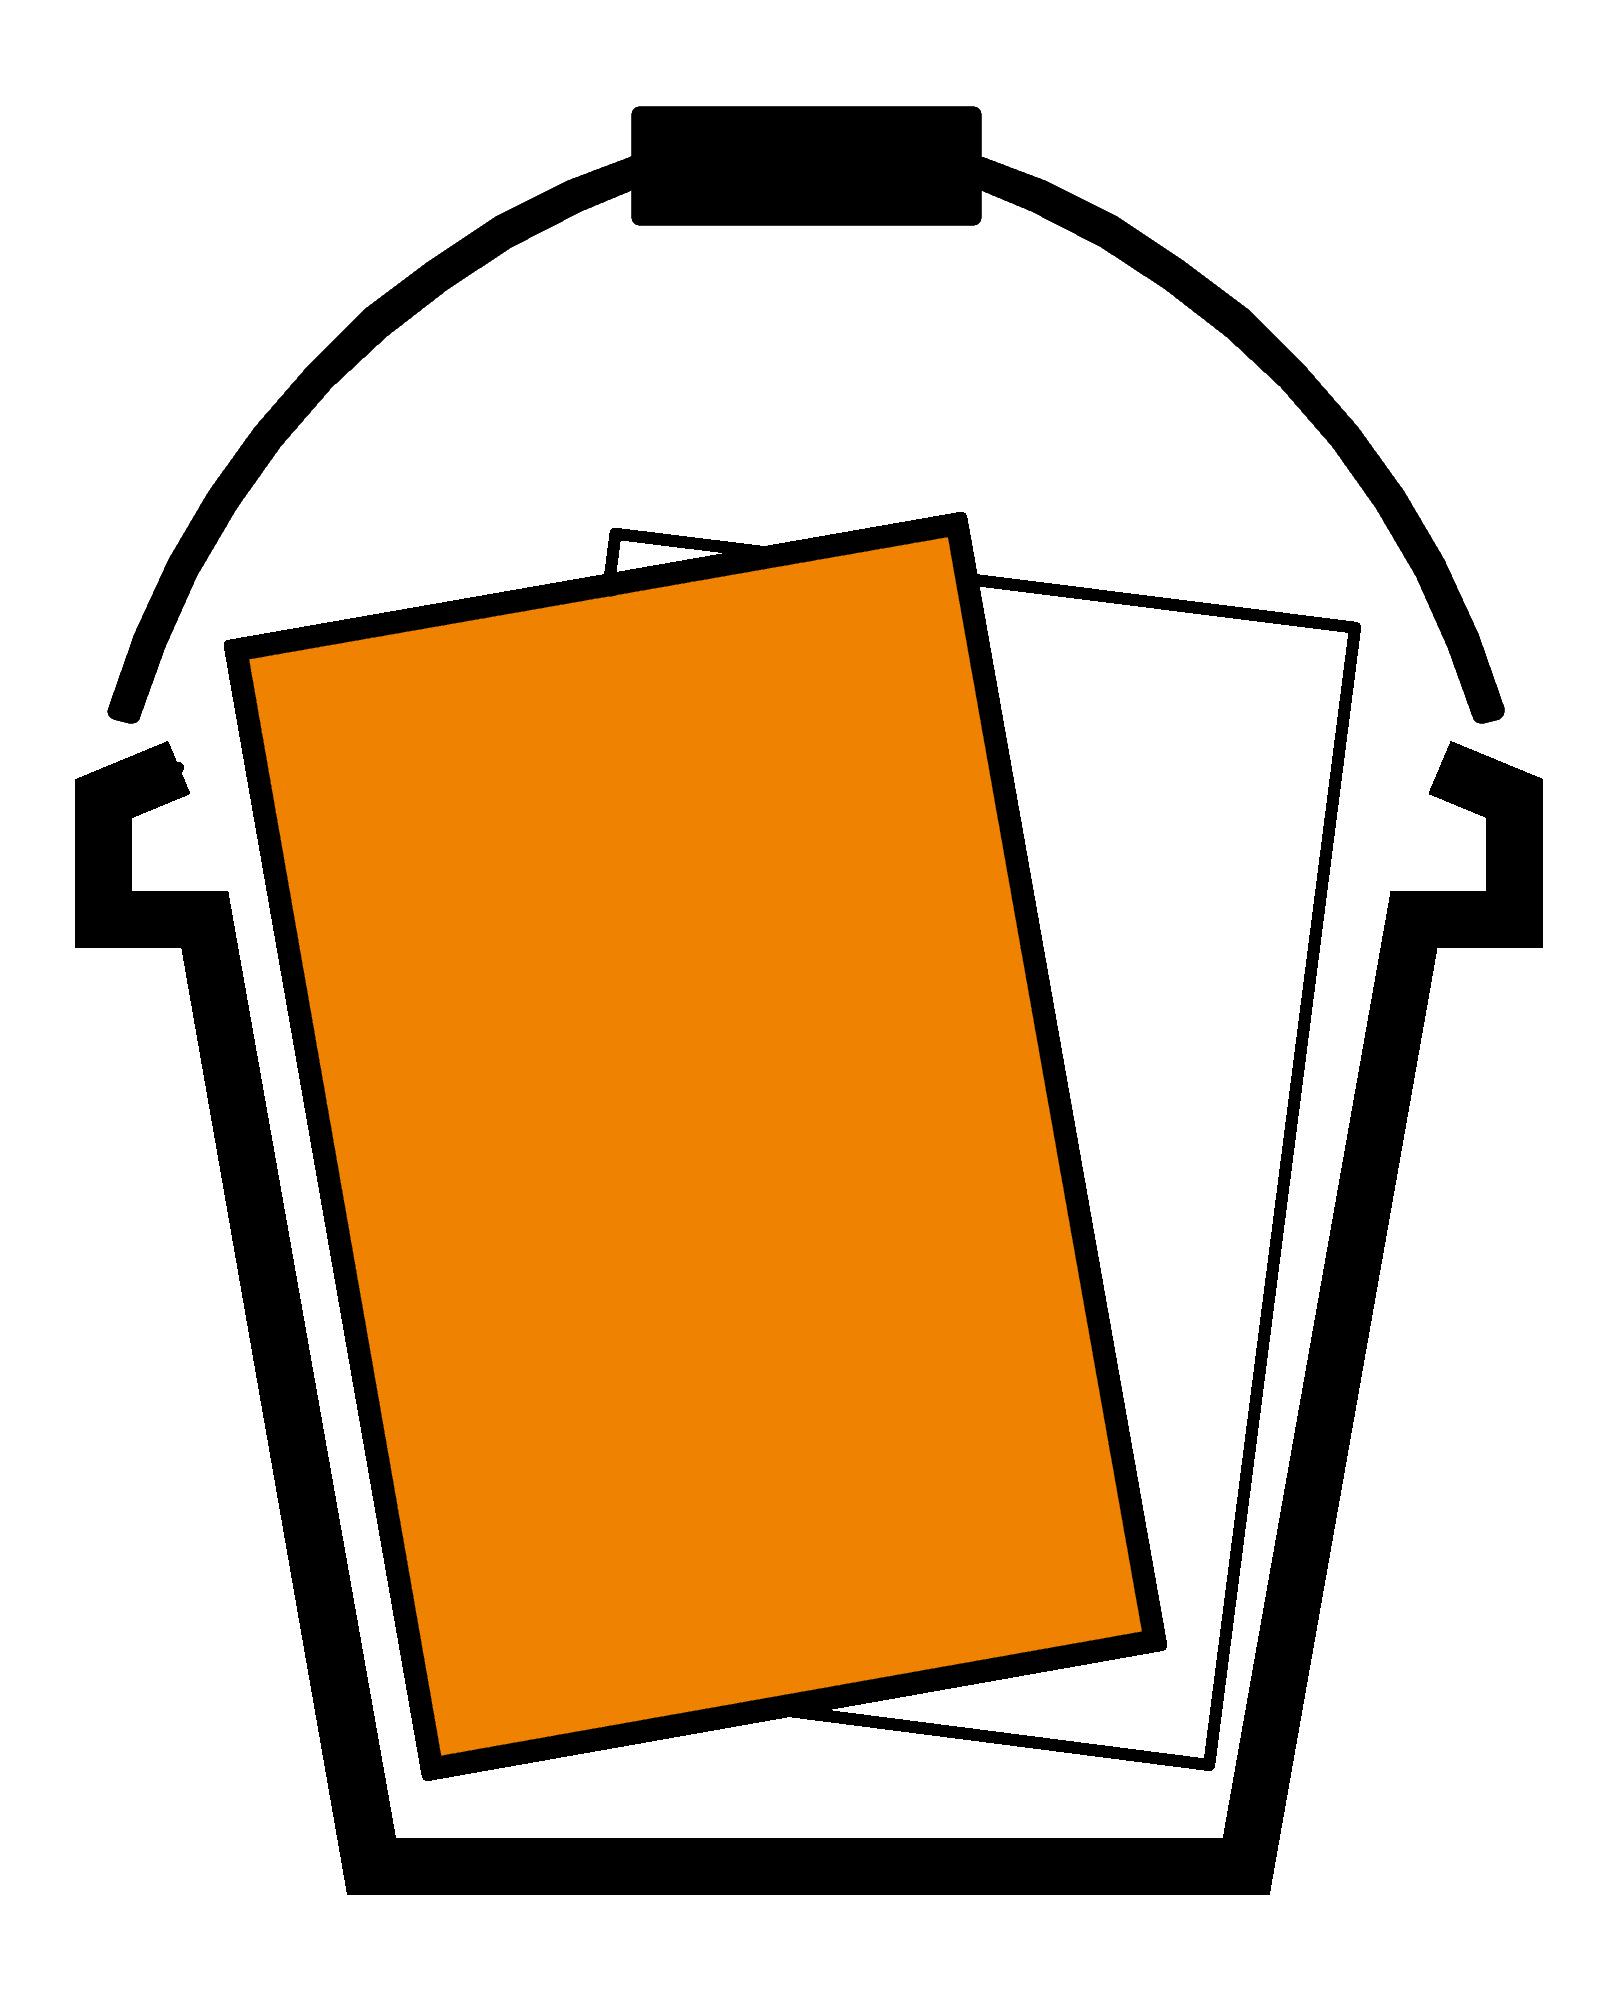 Filebucket